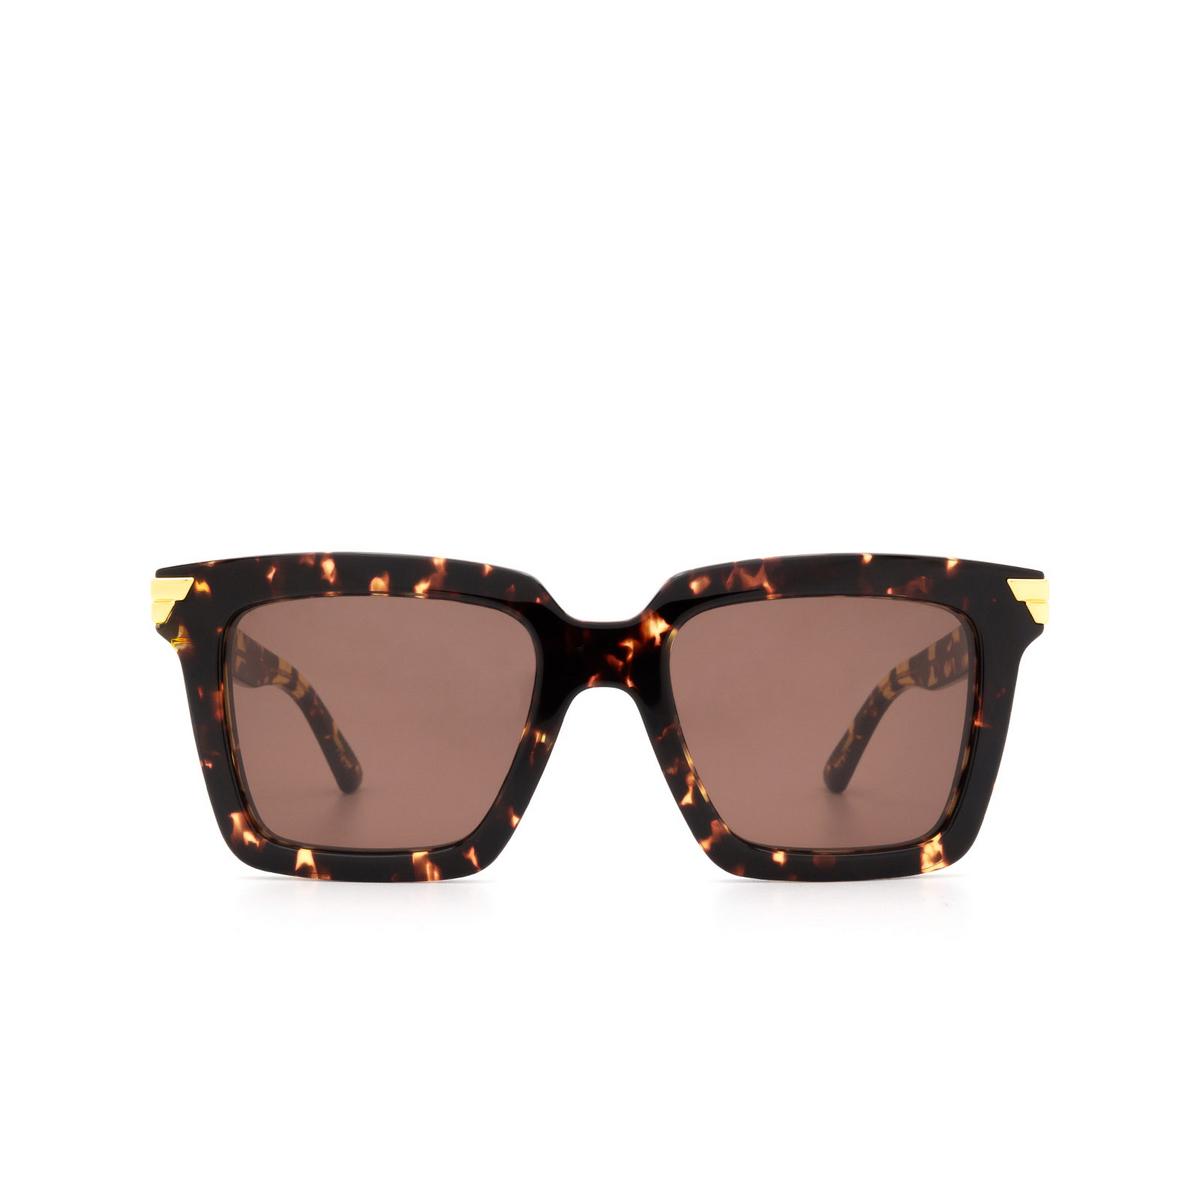 Bottega Veneta® Square Sunglasses: BV1005S color Havana 002 - front view.